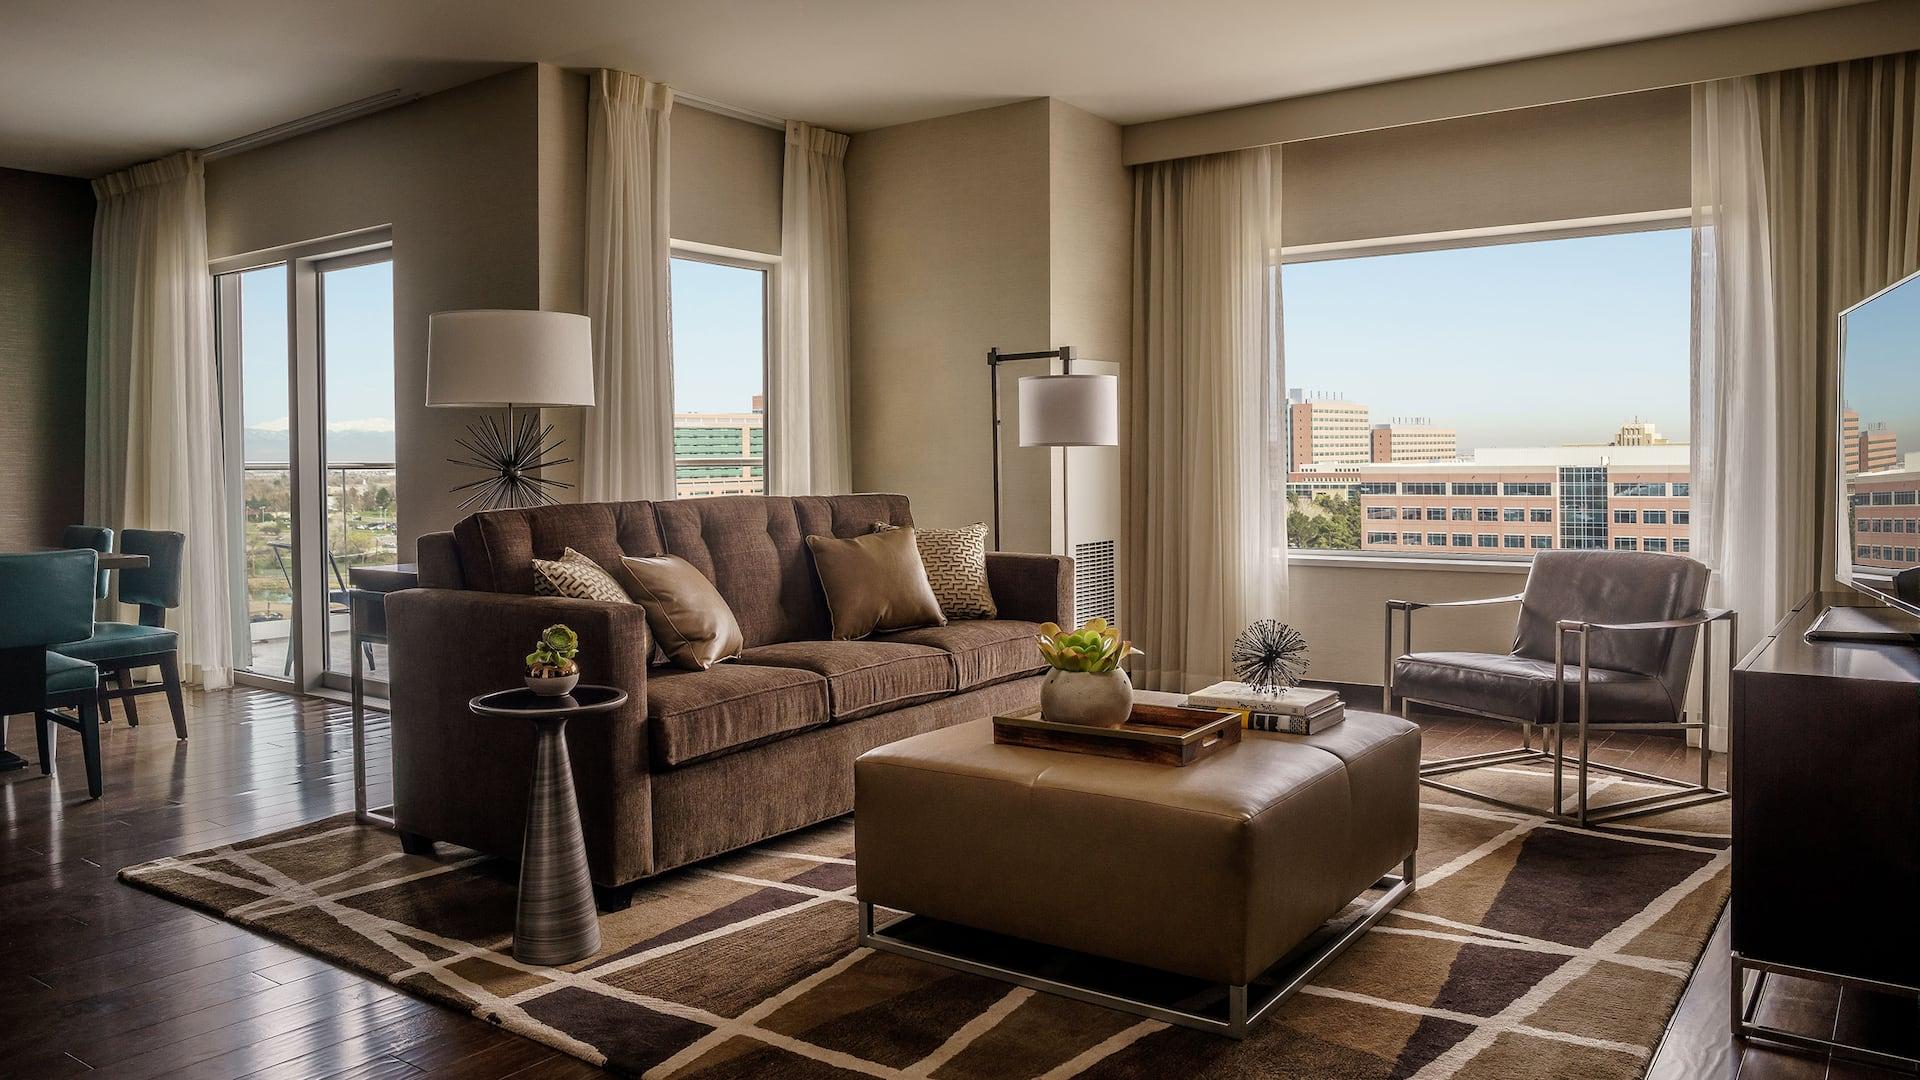 Denver Hotel Suite at Hyatt Regency Aurora-Denver